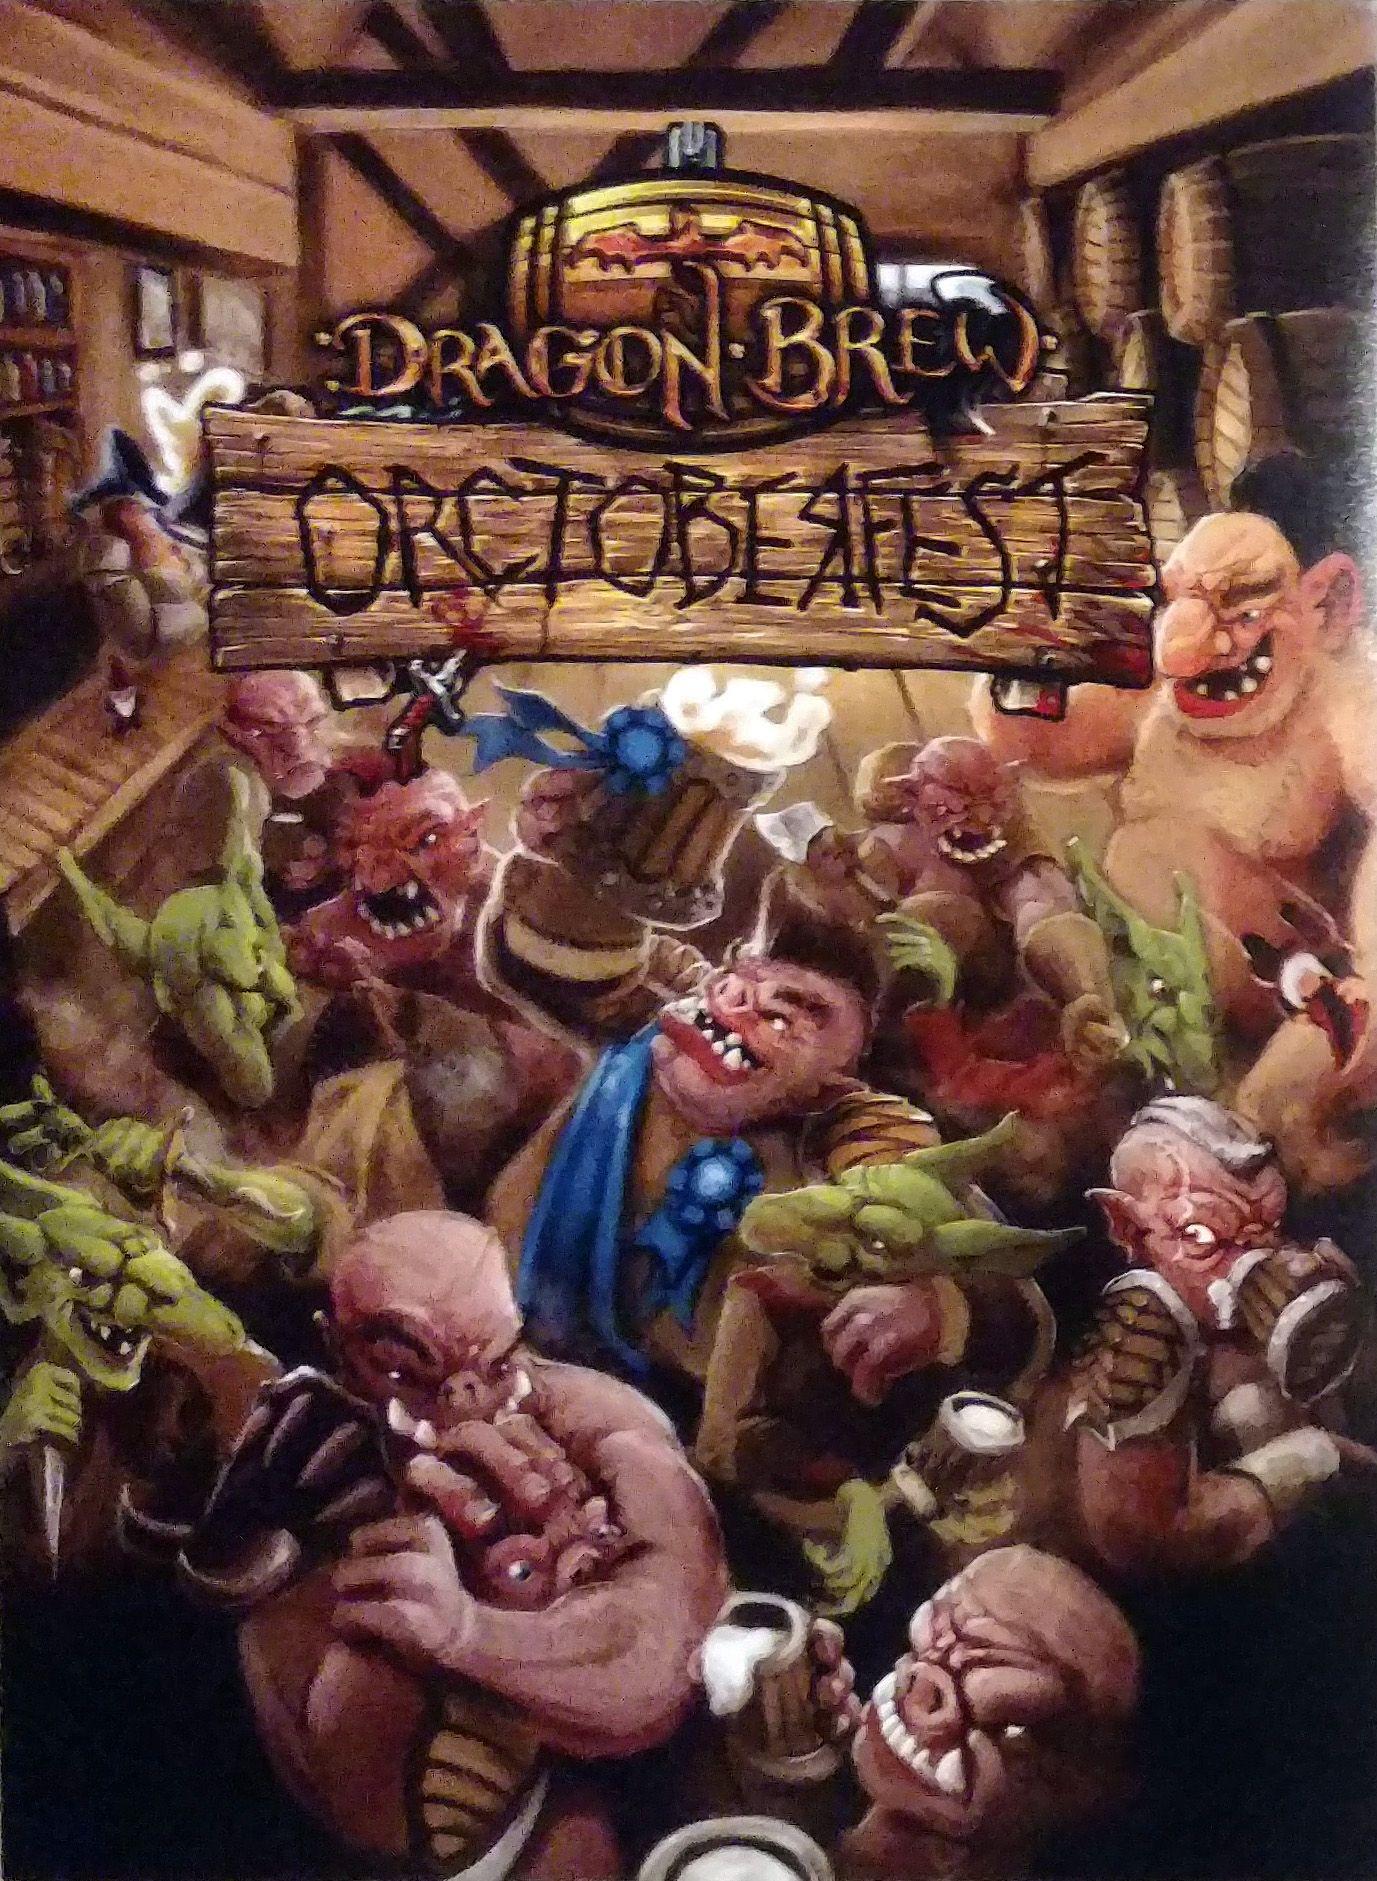 Dragon Brew: Orctoberfest